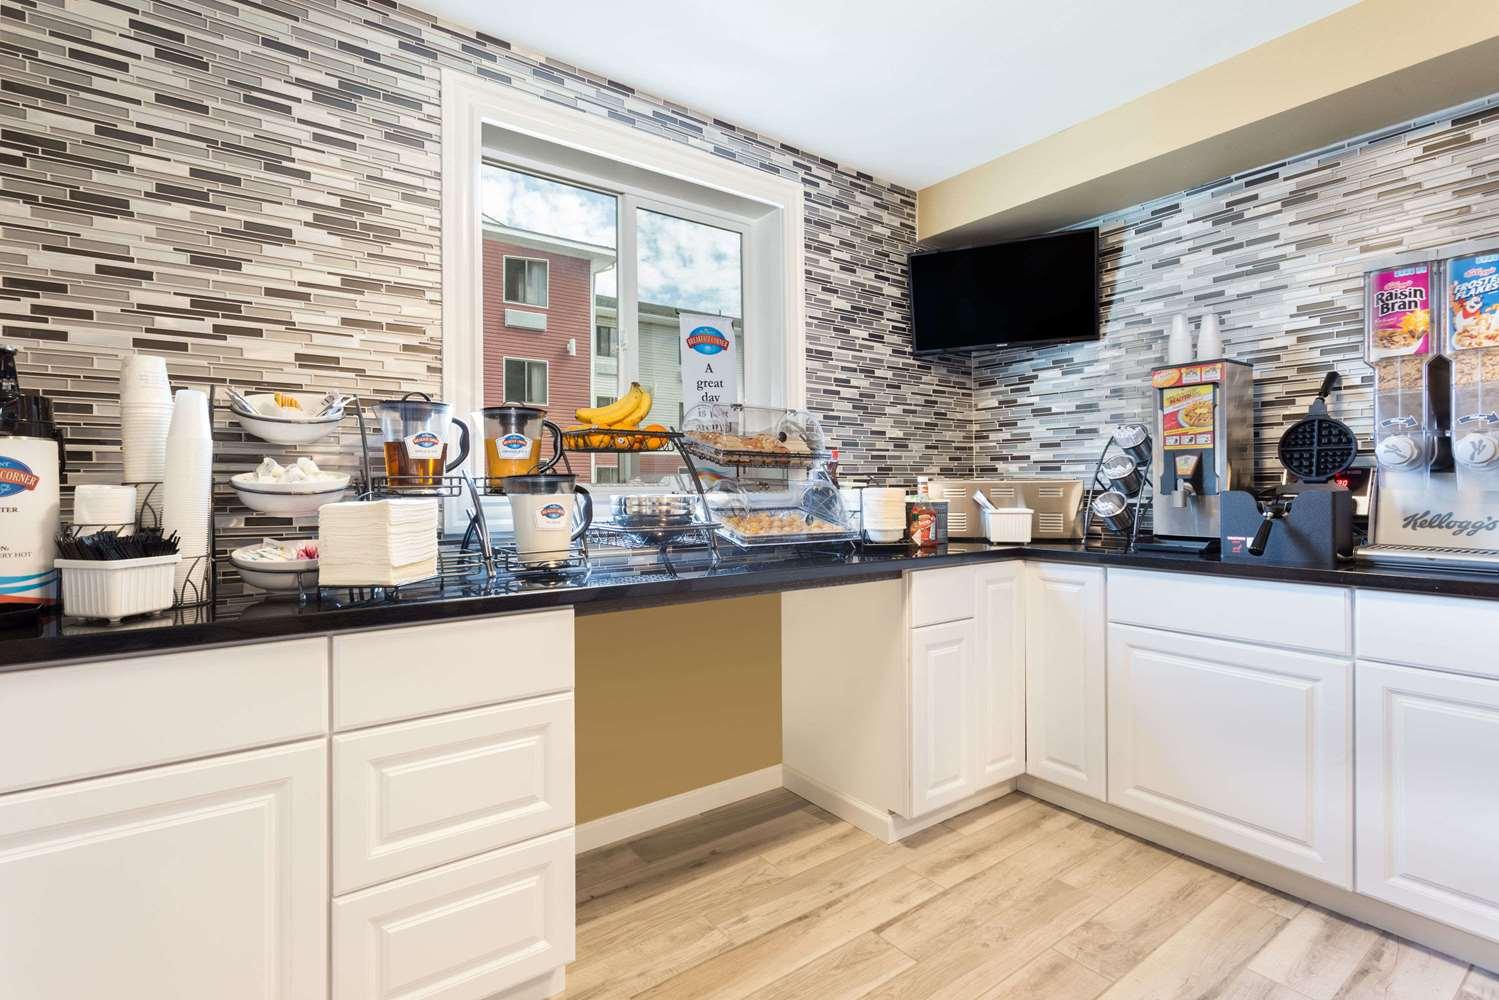 proam - Baymont Inn & Suites Spokane Valley